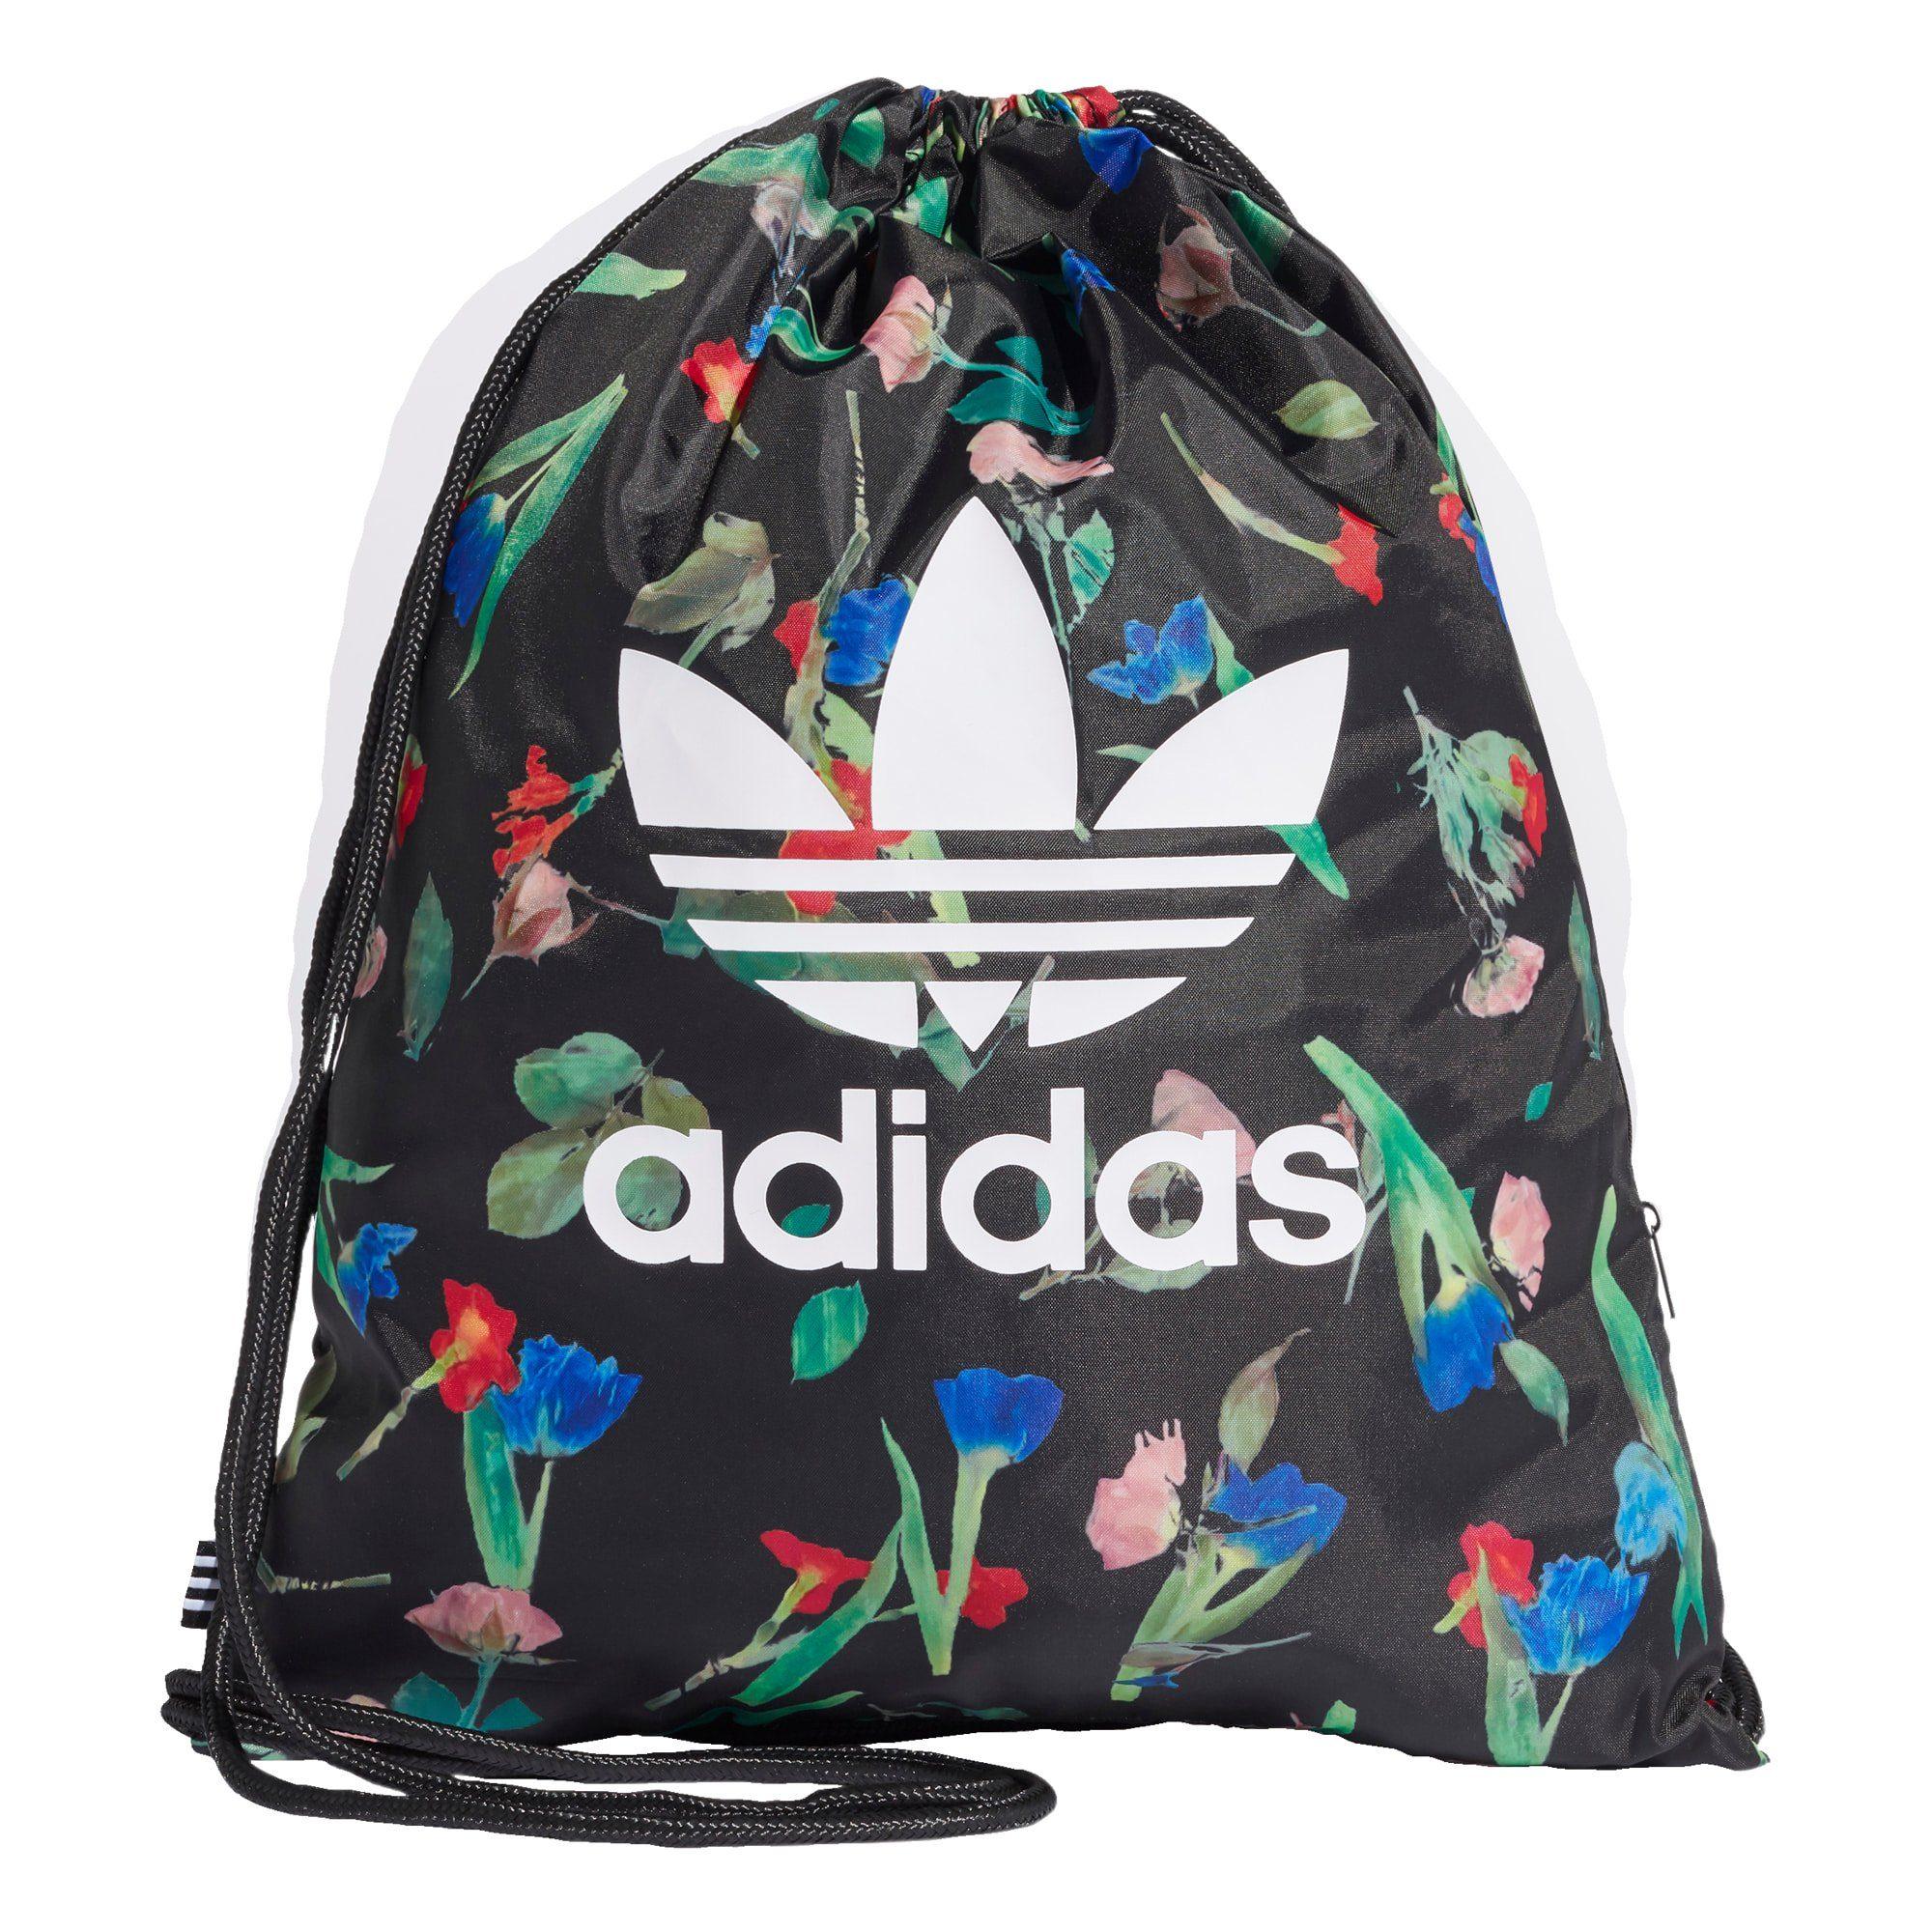 Unisex adidas Originals Sportrucksack »Sportbeutel«    04061619018752